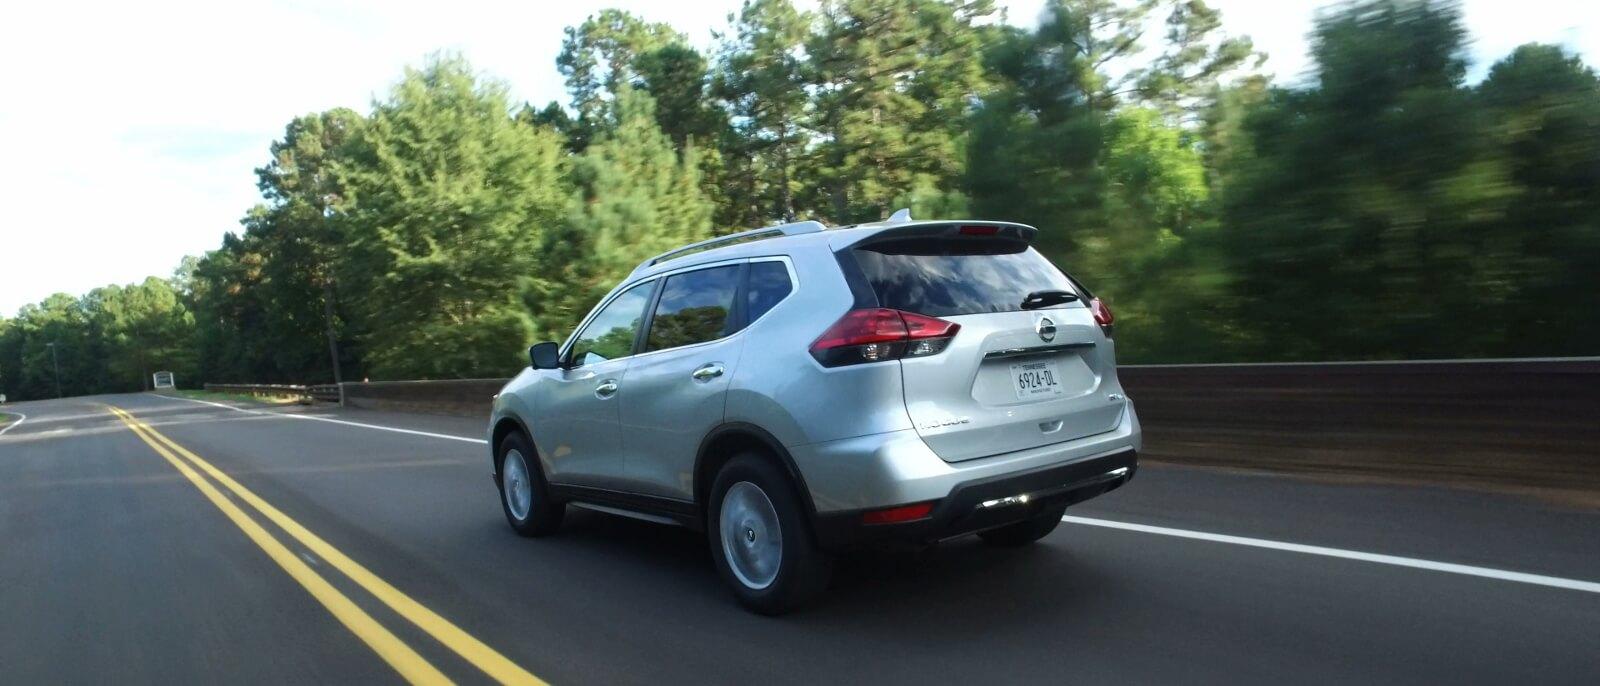 2017 Nissan Rogue rear exterior